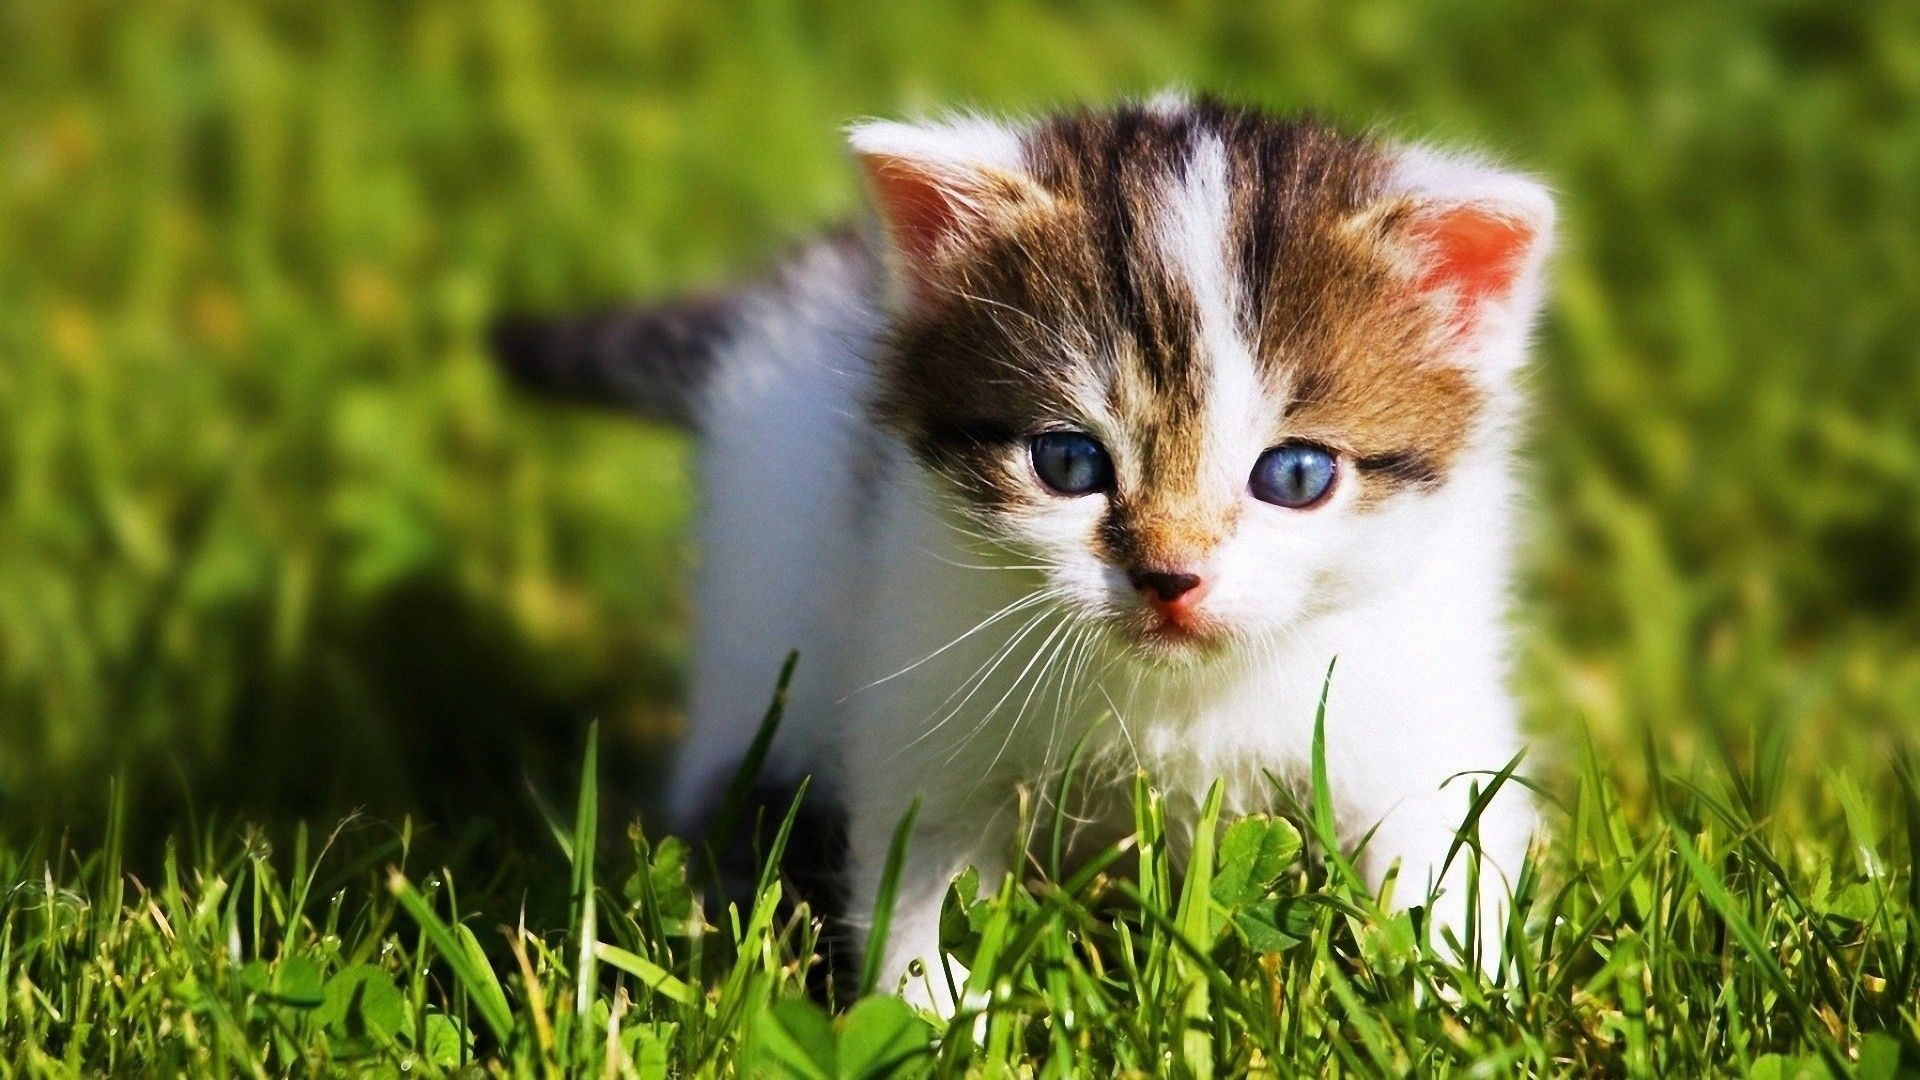 75 Animals Desktop Wallpapers On Wallpaperplay Kitten Wallpaper Pet Birds Animal Wallpaper